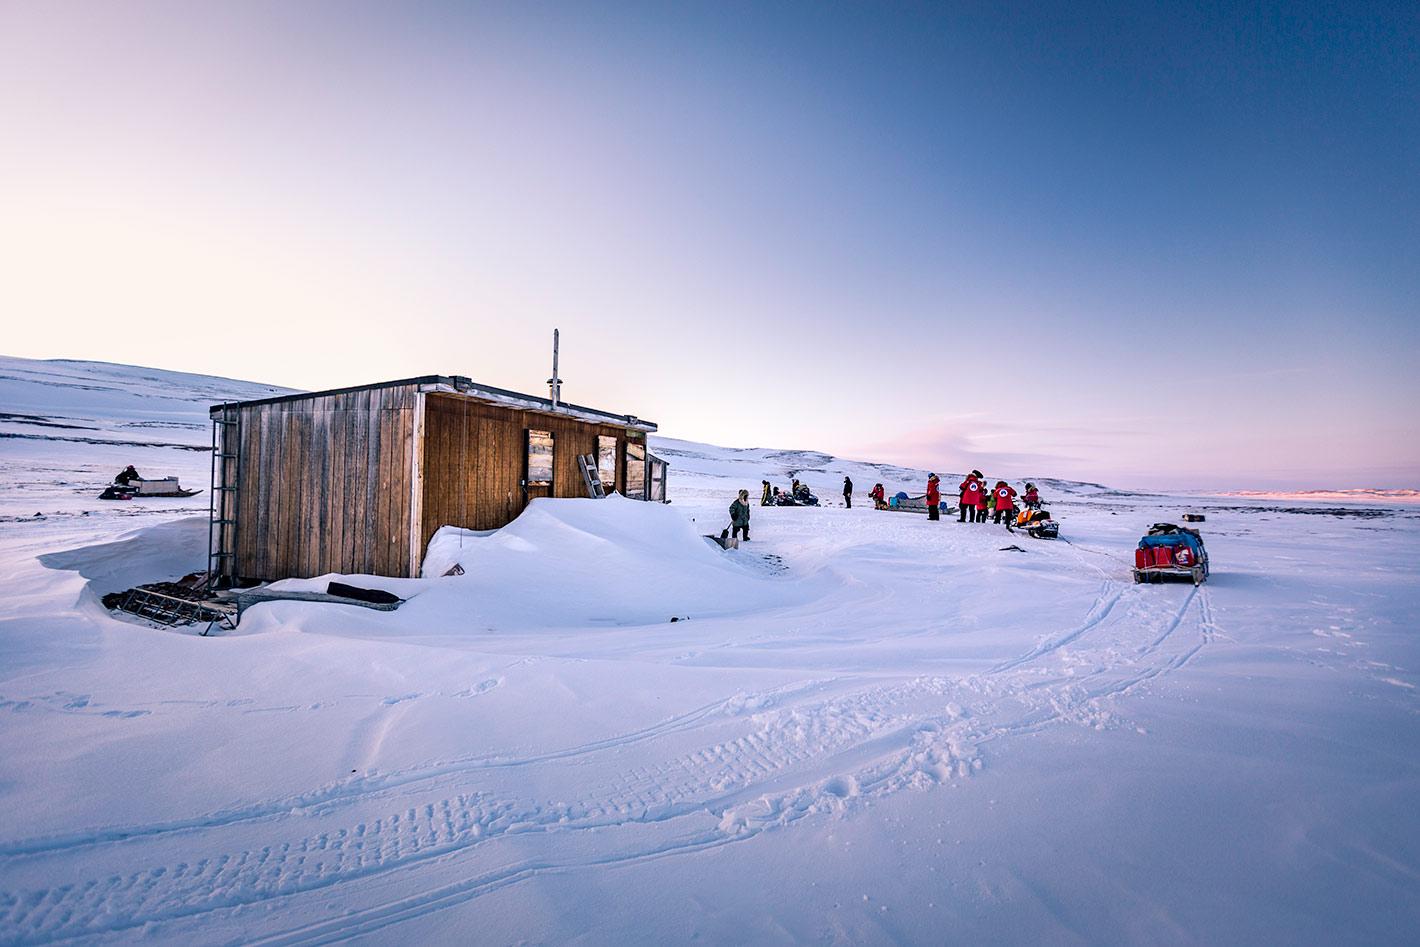 Valentin Pacaut Arctic nighttime